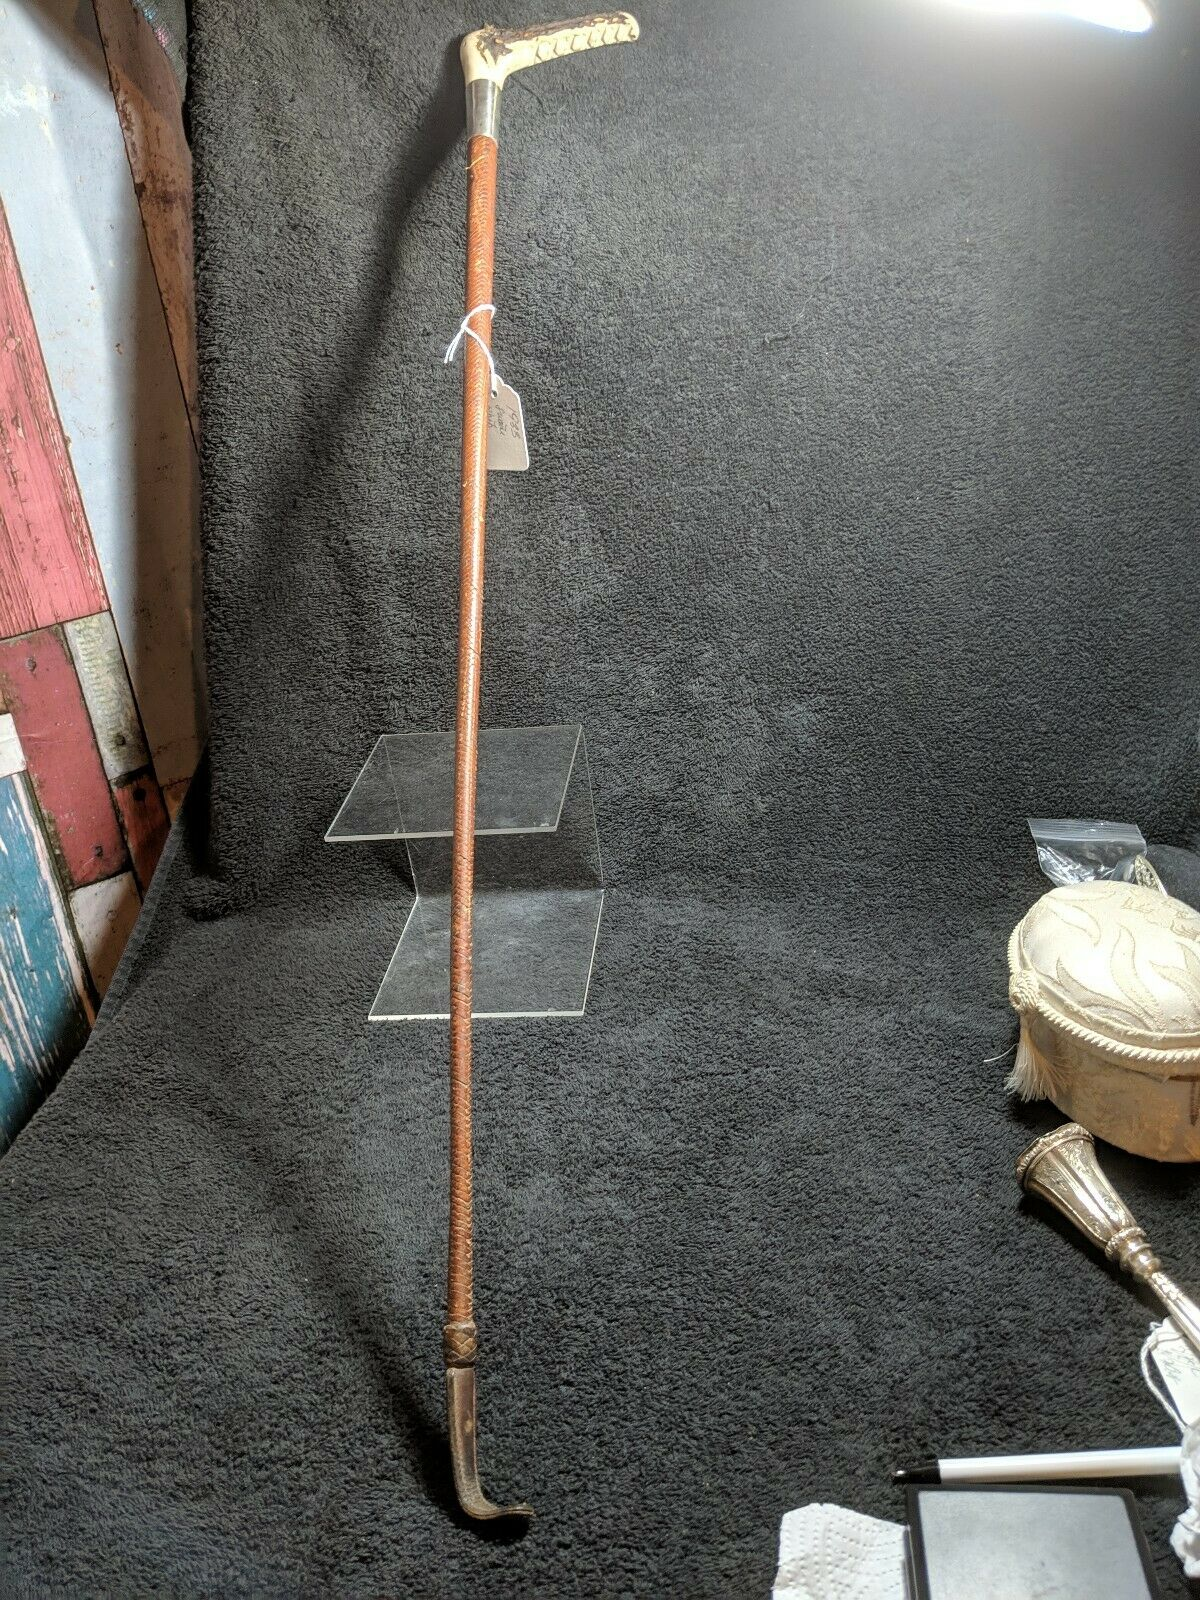 SUPERB ANTIQUE HALLMARKED LEATHER RIDING WHIP CROP 1933